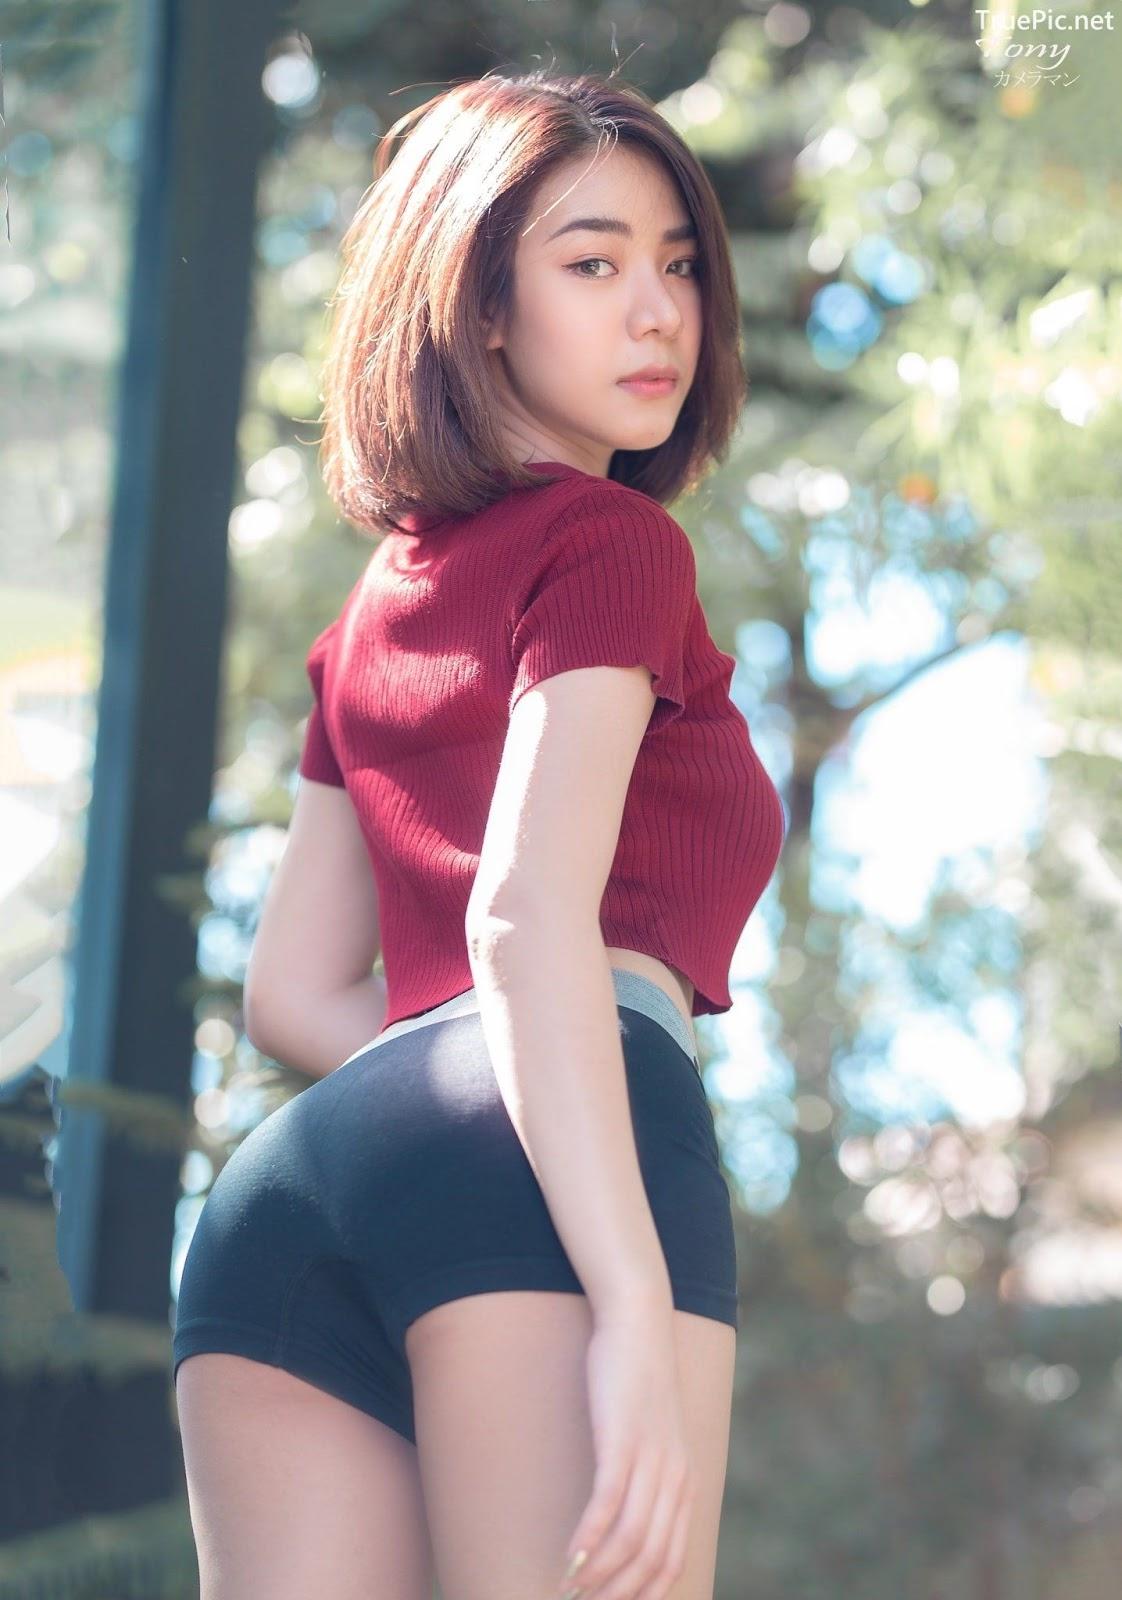 Image Thailand Model - Giekao Klaoruethai - CK Female Boxer - TruePic.net - Picture-8